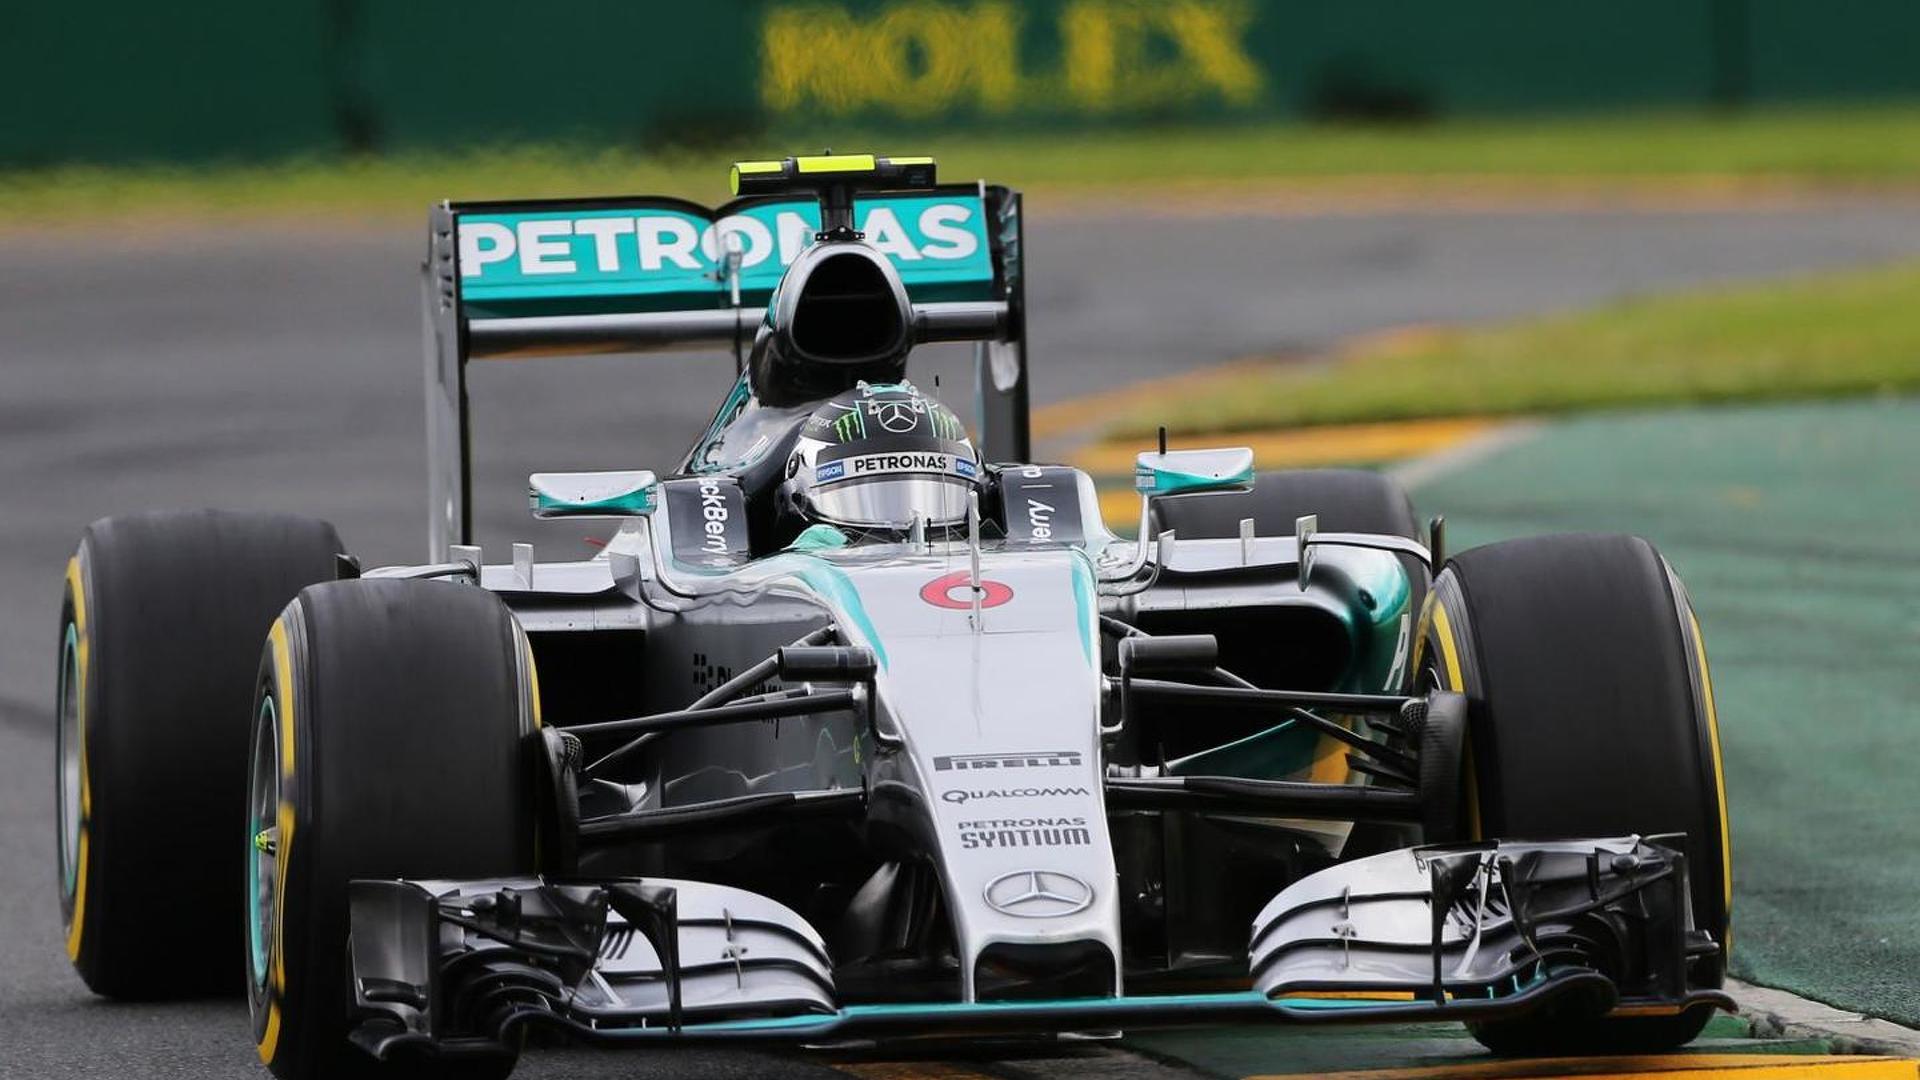 Car, not engine explains Mercedes gap